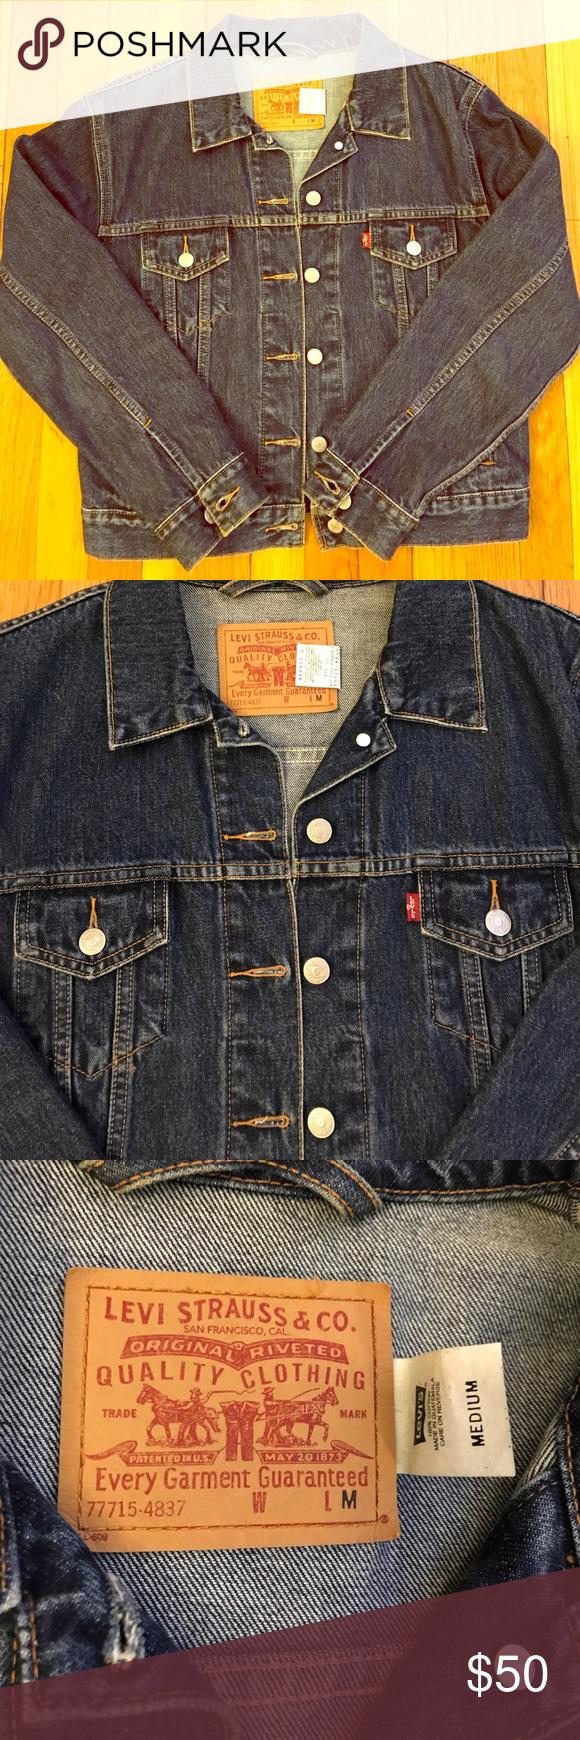 Vintage Levi S Indigo Denim Jacket Lower Price Indigo Denim Jacket Denim Jacket Denim Jacket Women [ 1740 x 580 Pixel ]